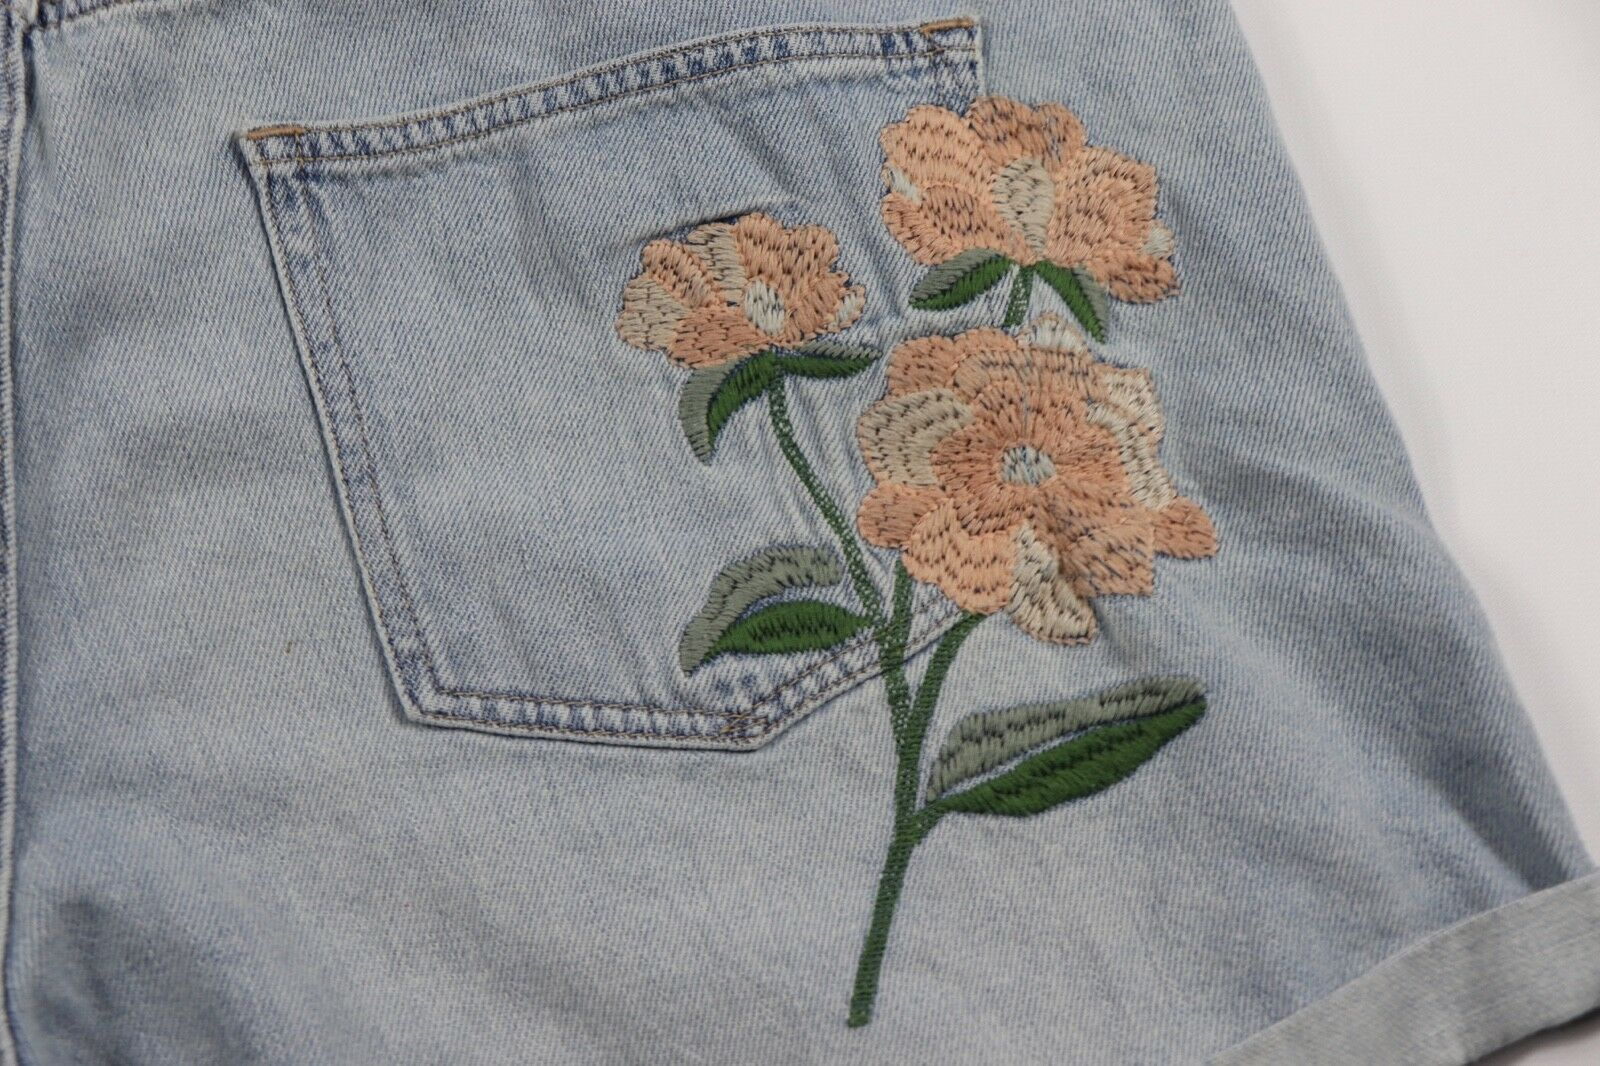 New Gap Women's 34 Regular Embroidered Floral Denim Jean Shorts Blue Cotton